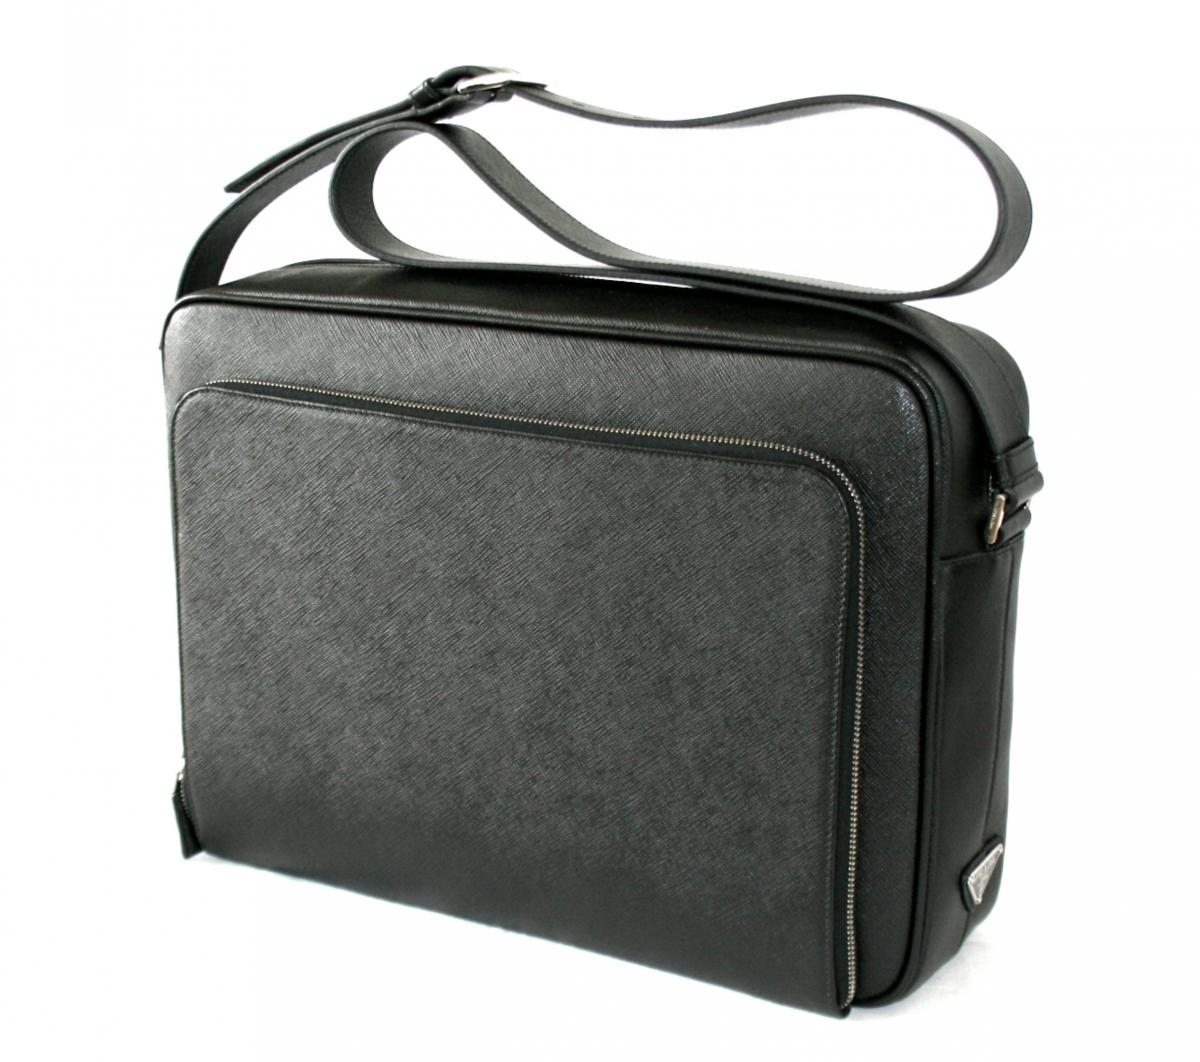 2e07d017c0db AUTHENTIC LUXURY PRADA SAFFIANO MESSENGER BAG VA0998 NEW .